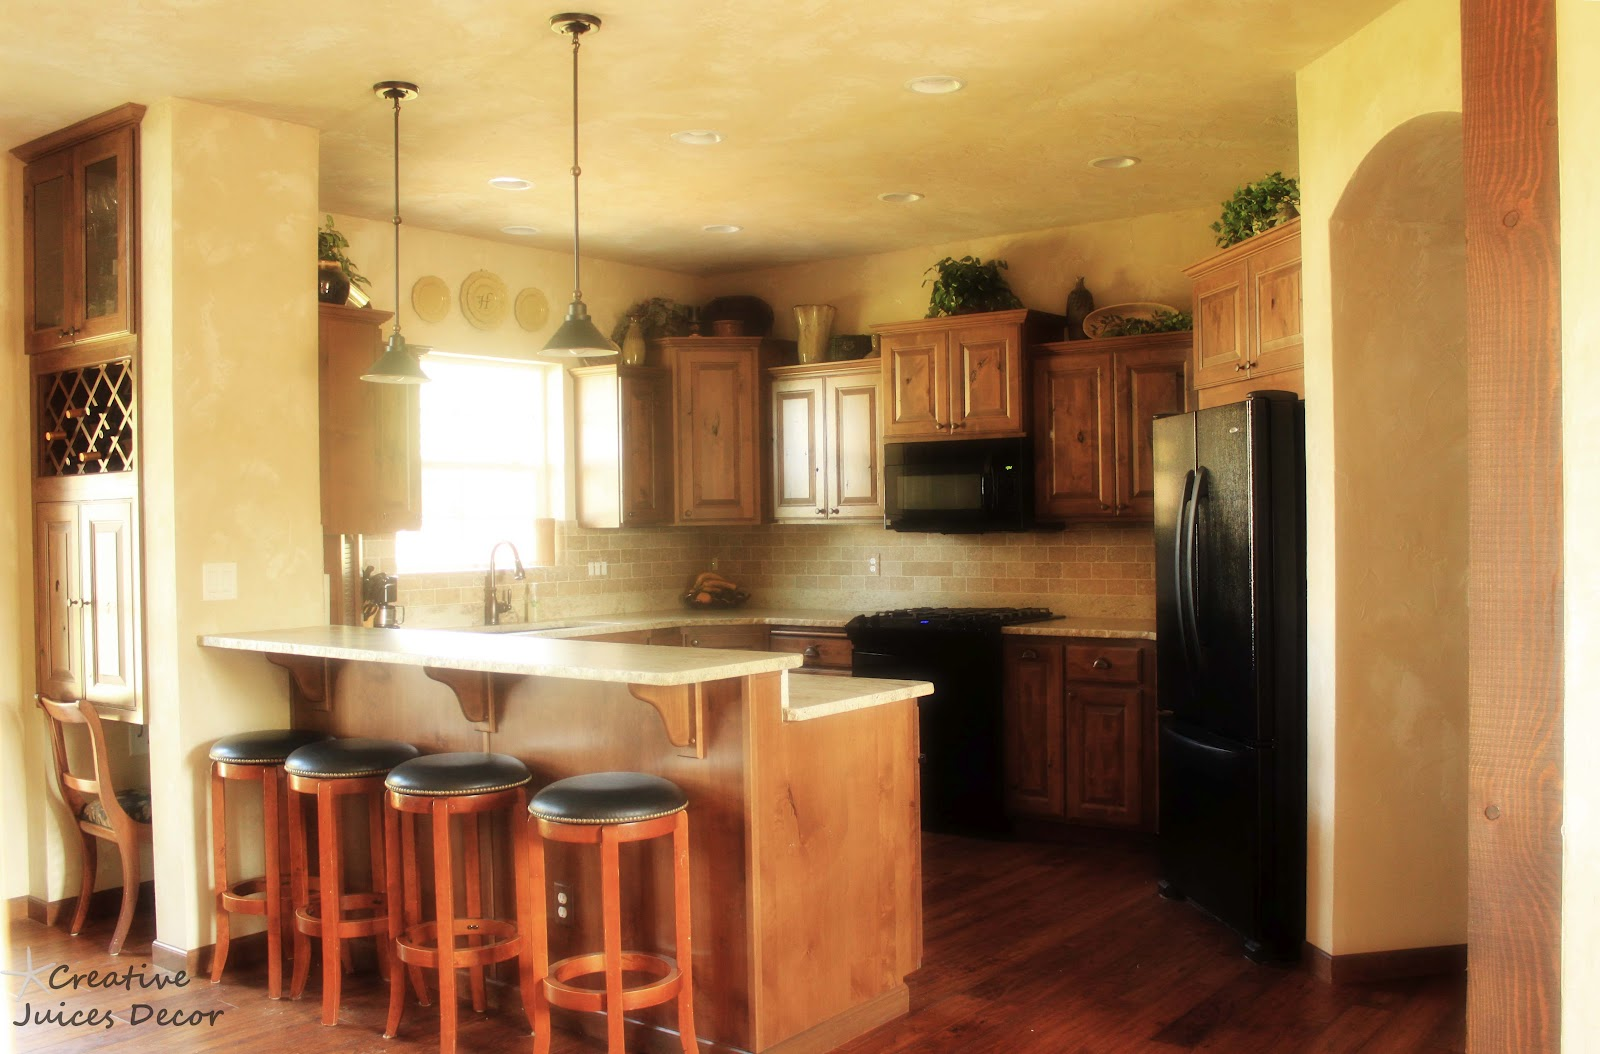 decorating tops cabinets tops decorative tables ideas kitchen cabinet tops decorate kitchen cabinet tops